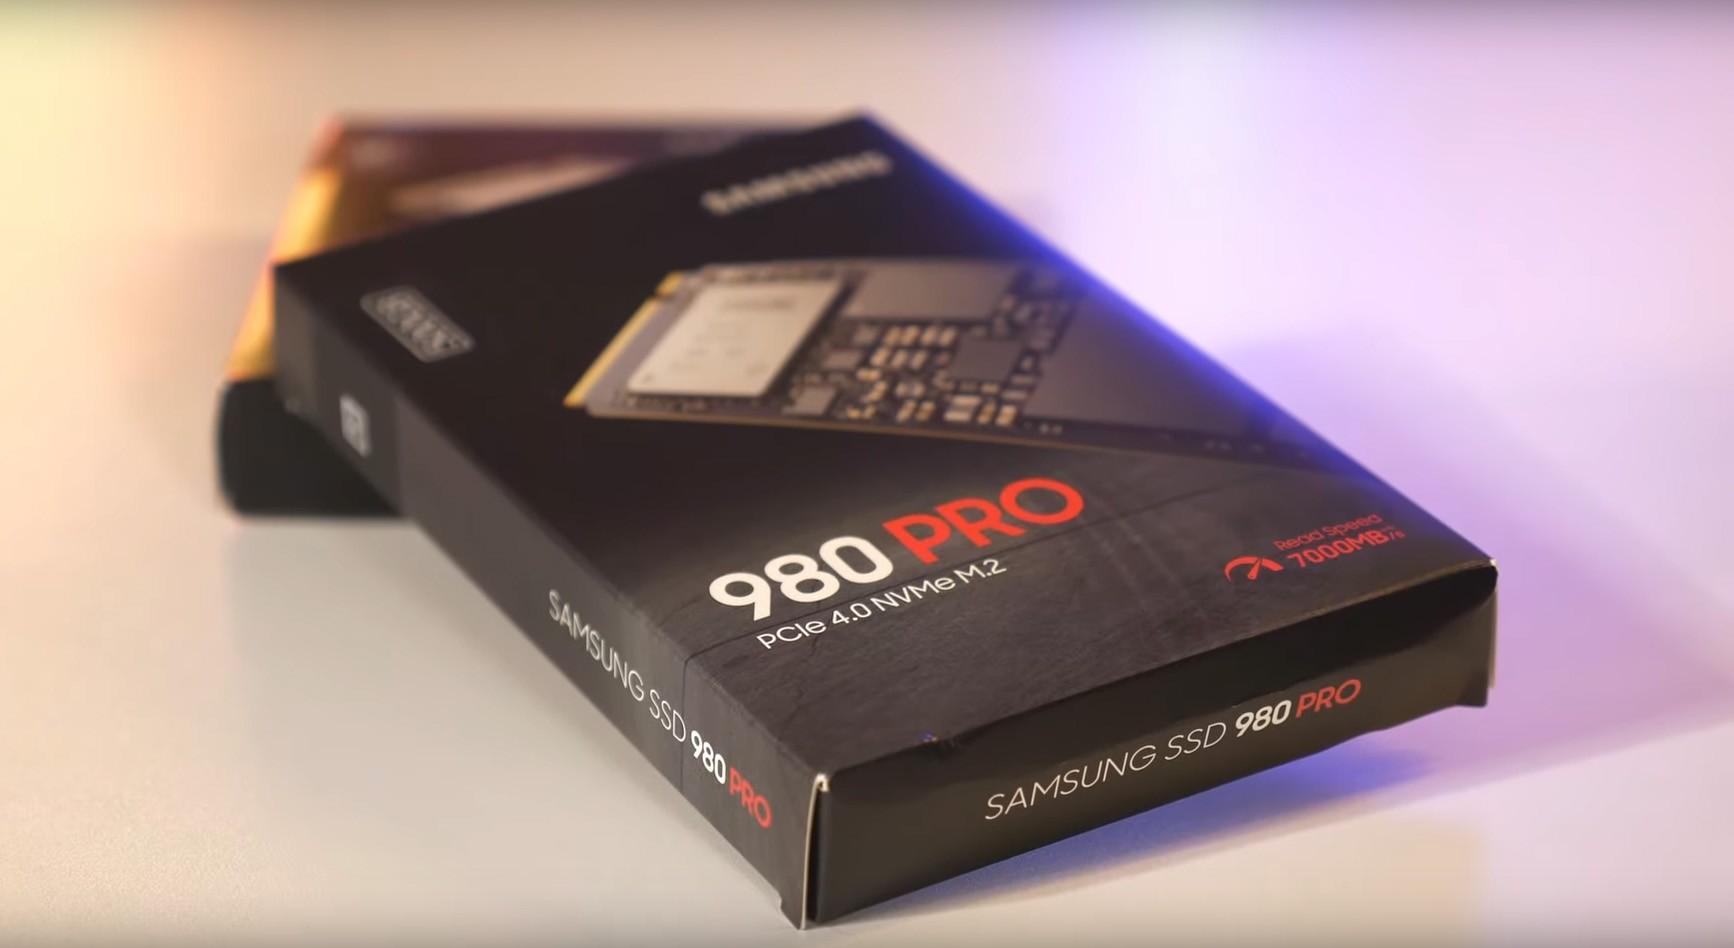 Ổ cứng SSD Samsung 980 PRO 500GB PCIe 4.0 M.2 NVMe